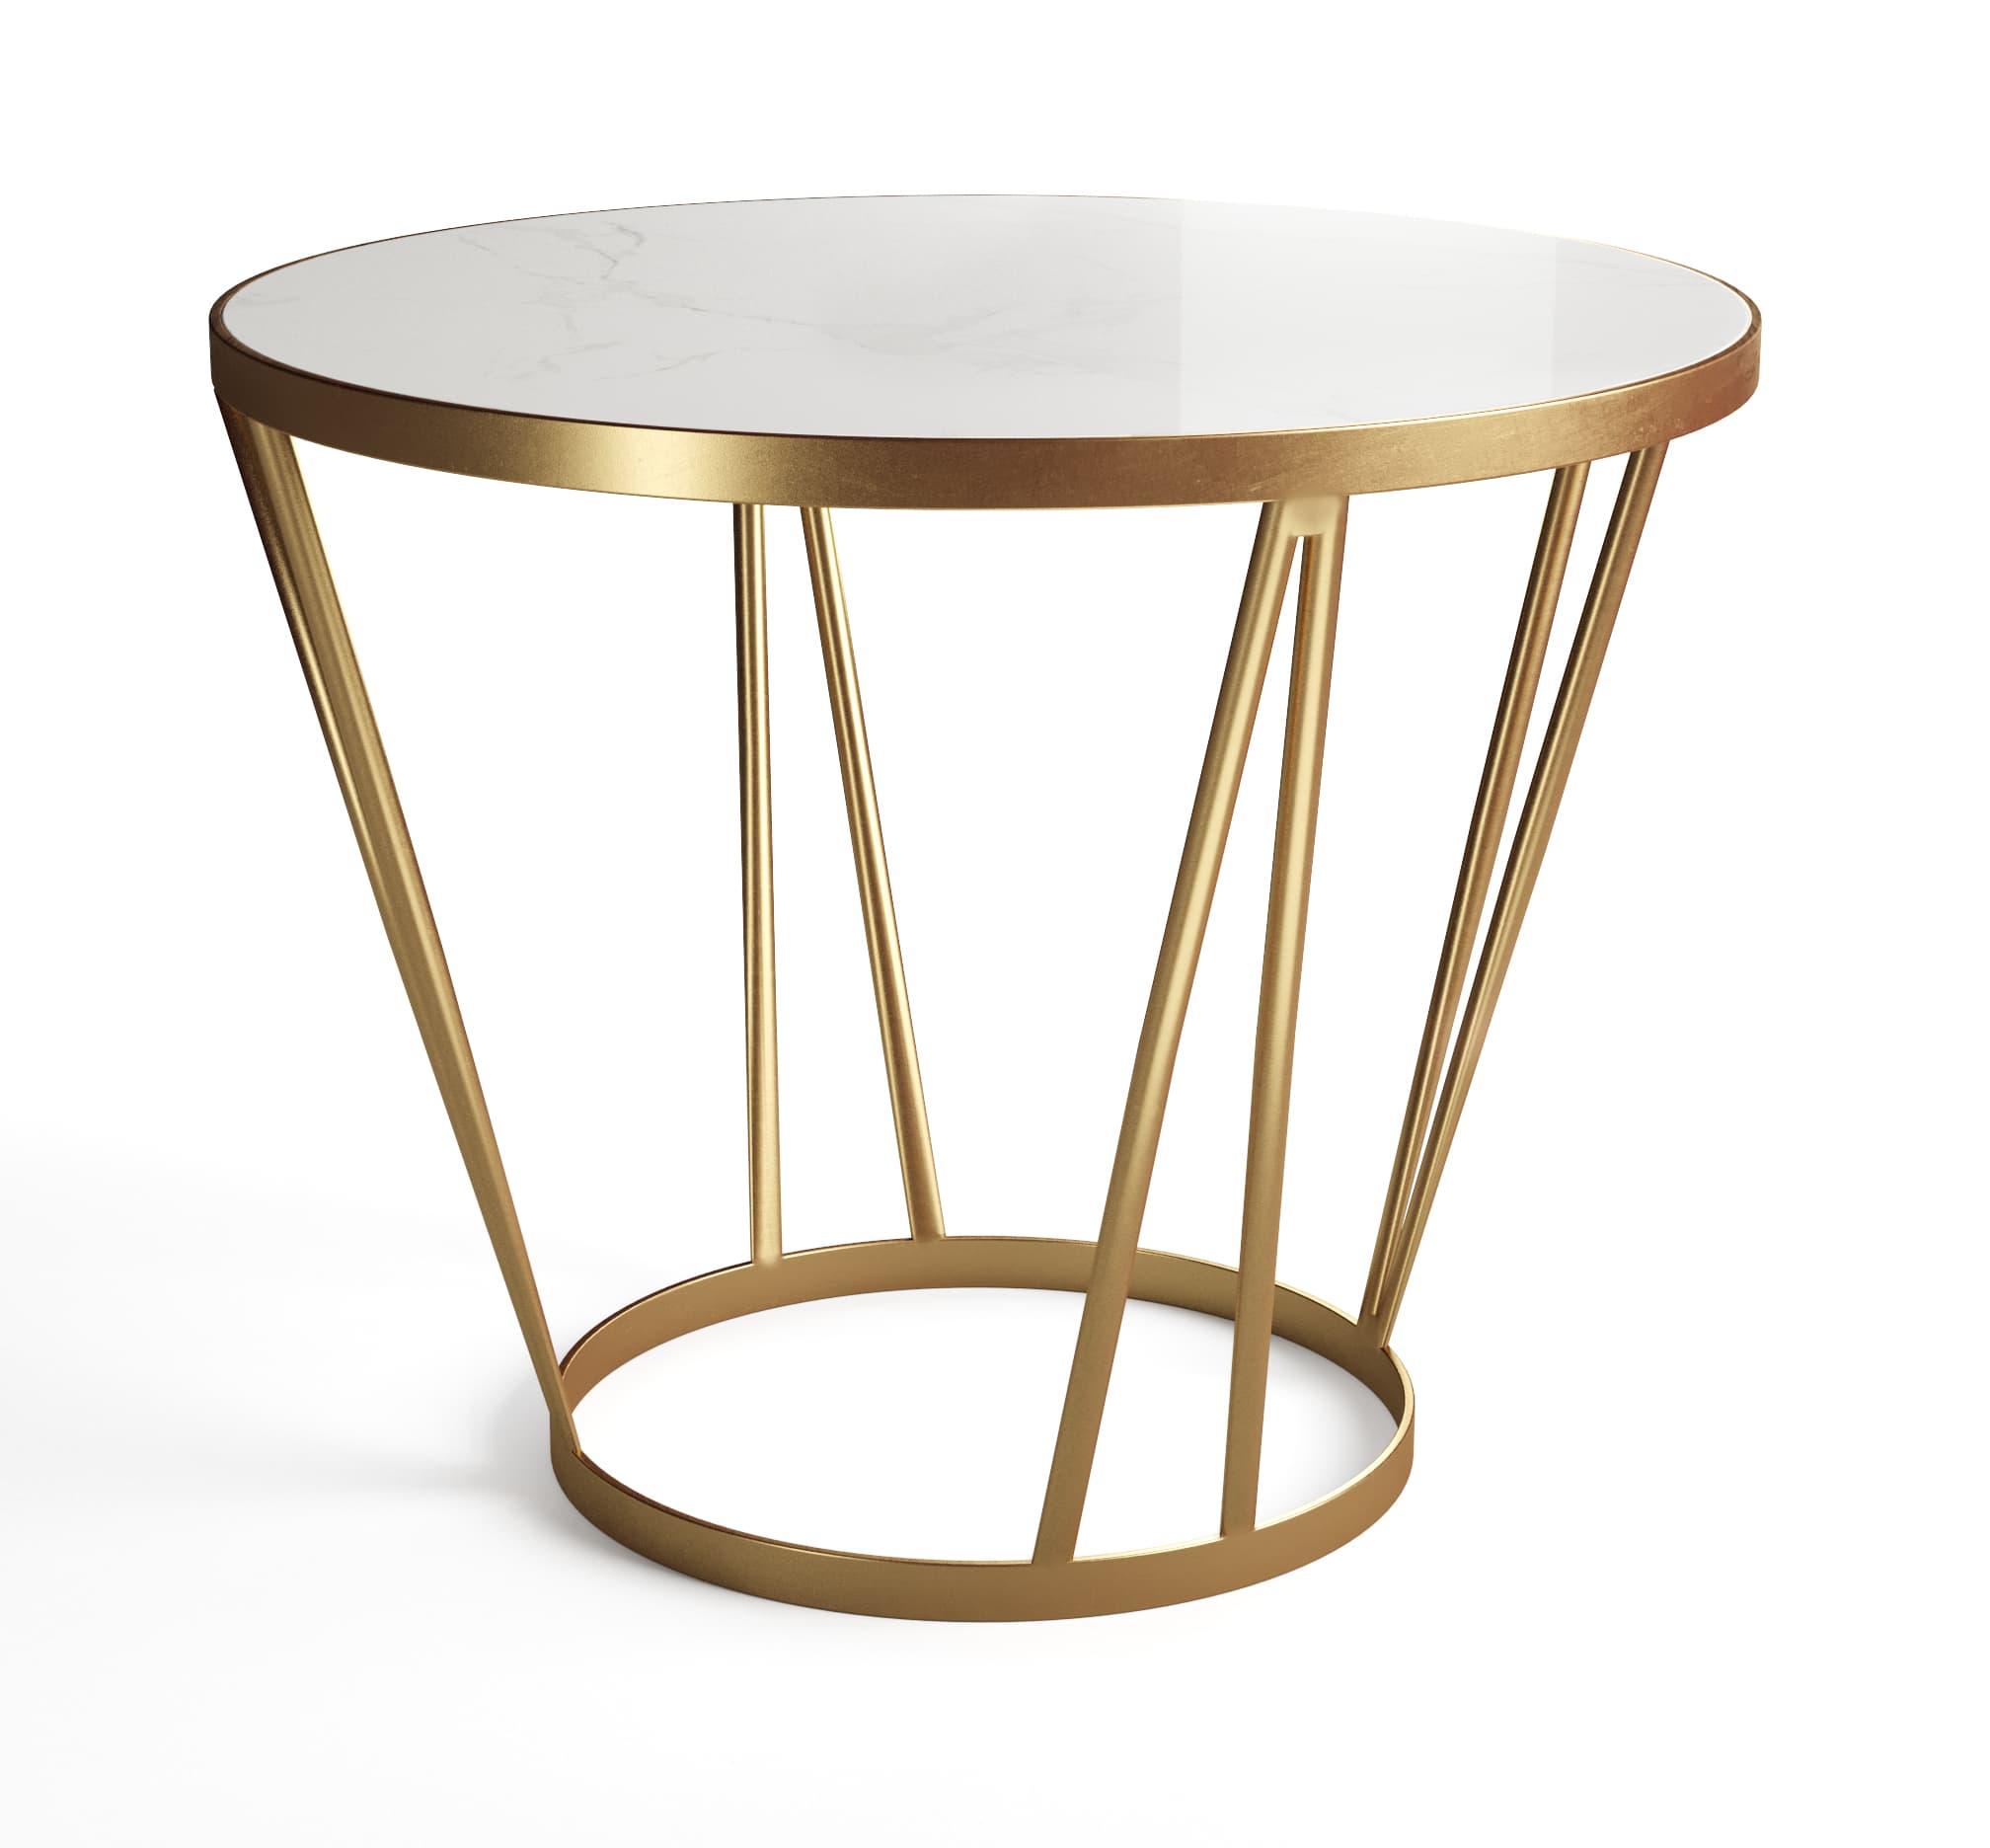 Журнальный столик Any-Home L031 - L031 | AnyHome.ru